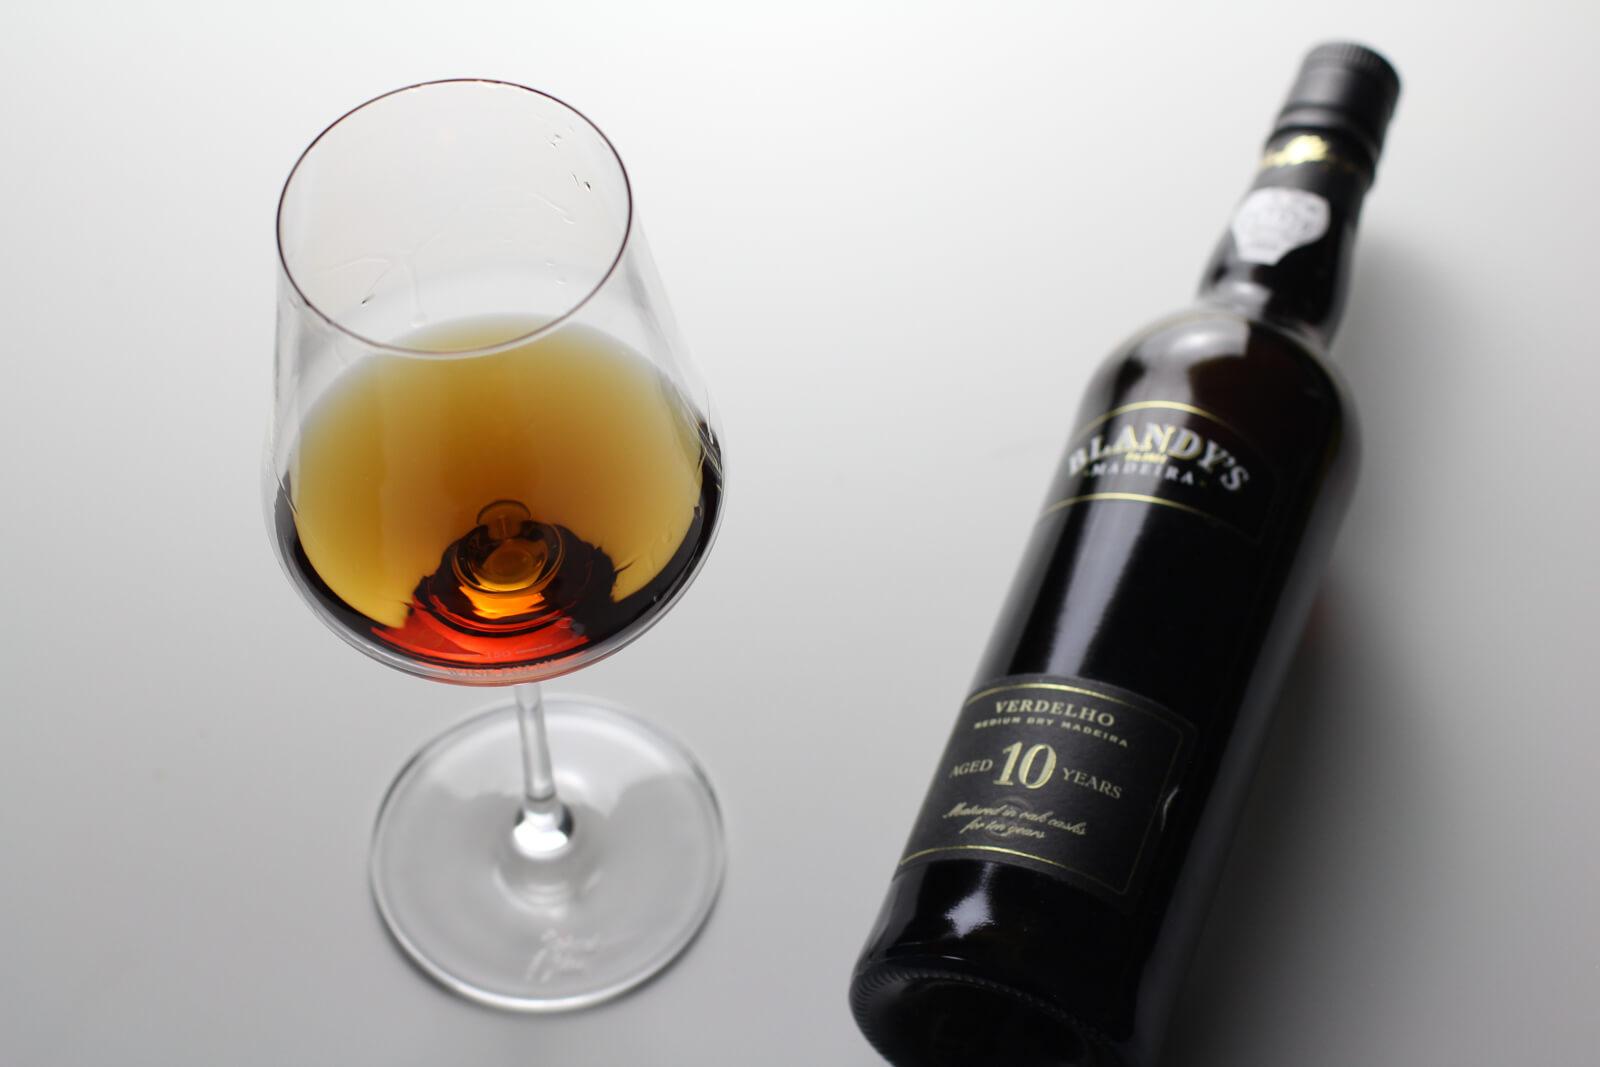 Verdelho-Madeira-Wine-Glass-Blandys-WineFolly